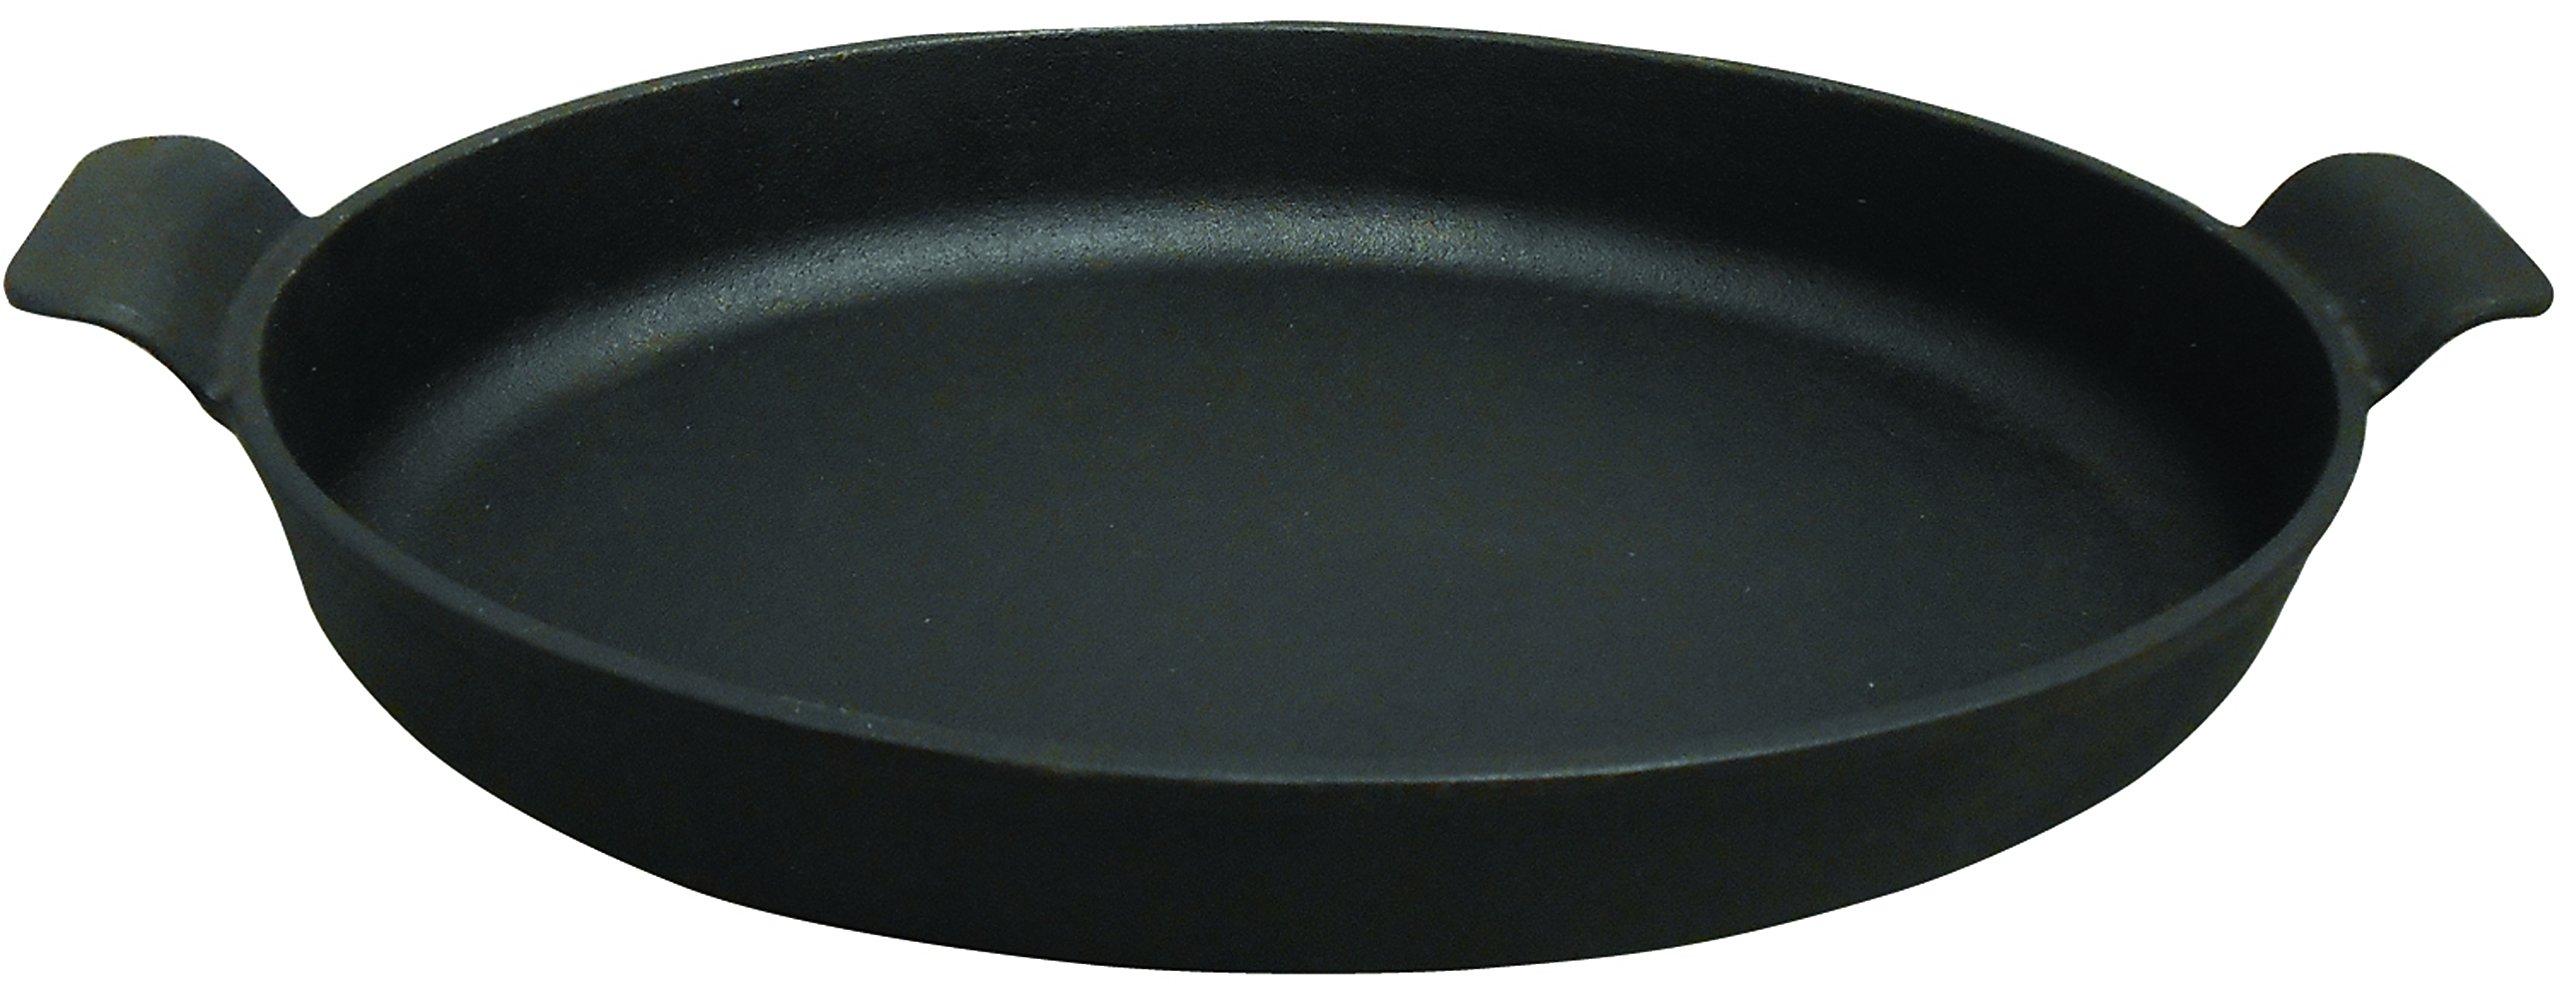 King Kooker CIOR14S Pre-Seasoned Cast Iron Oval Roasting Pan